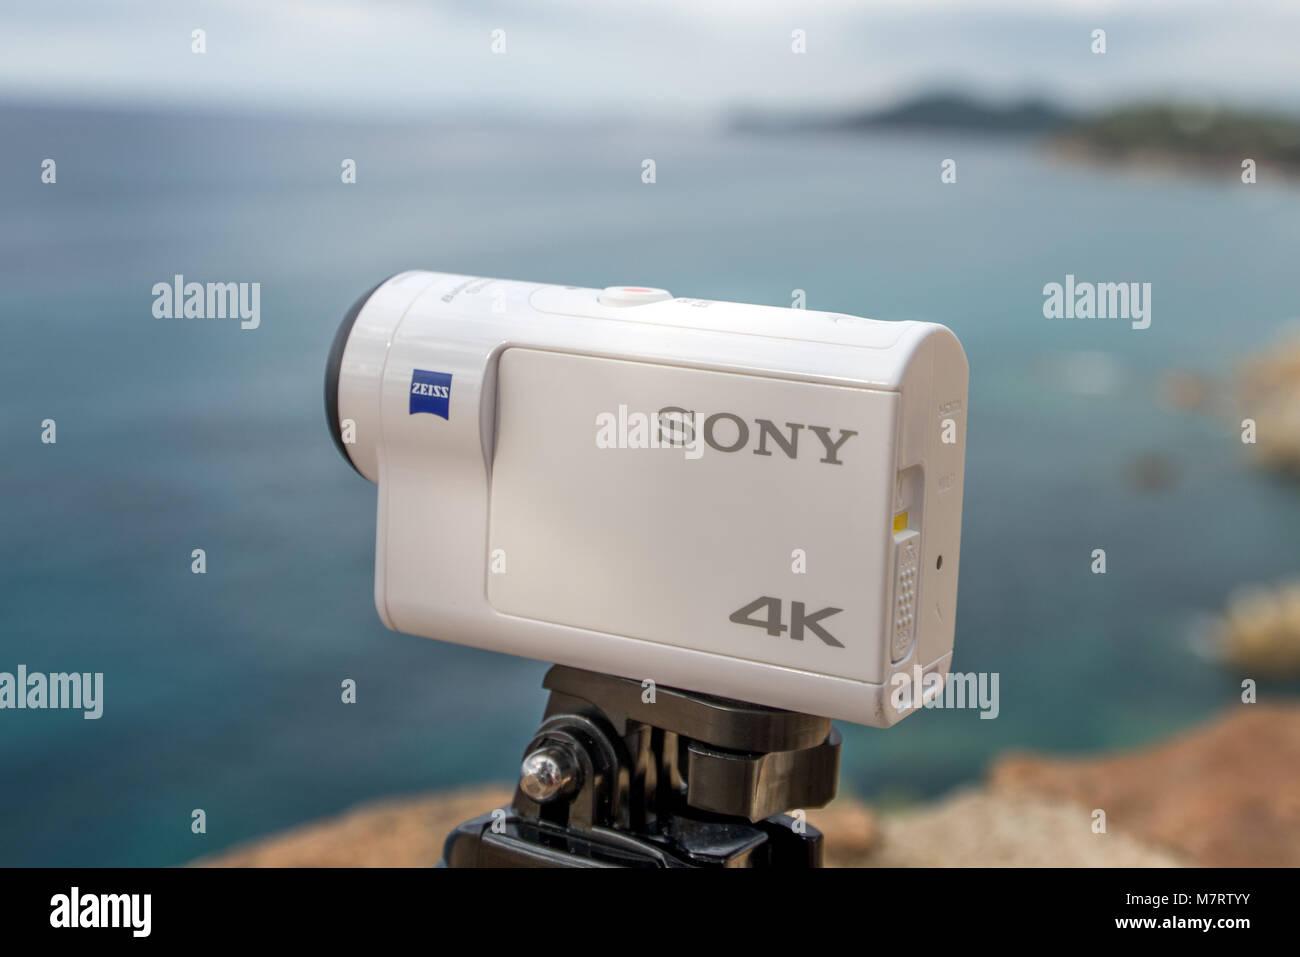 Spain Lloret de Mar September 2017. Action camera Sony x 3000 against the sea. Illustrative editorial. - Stock Image